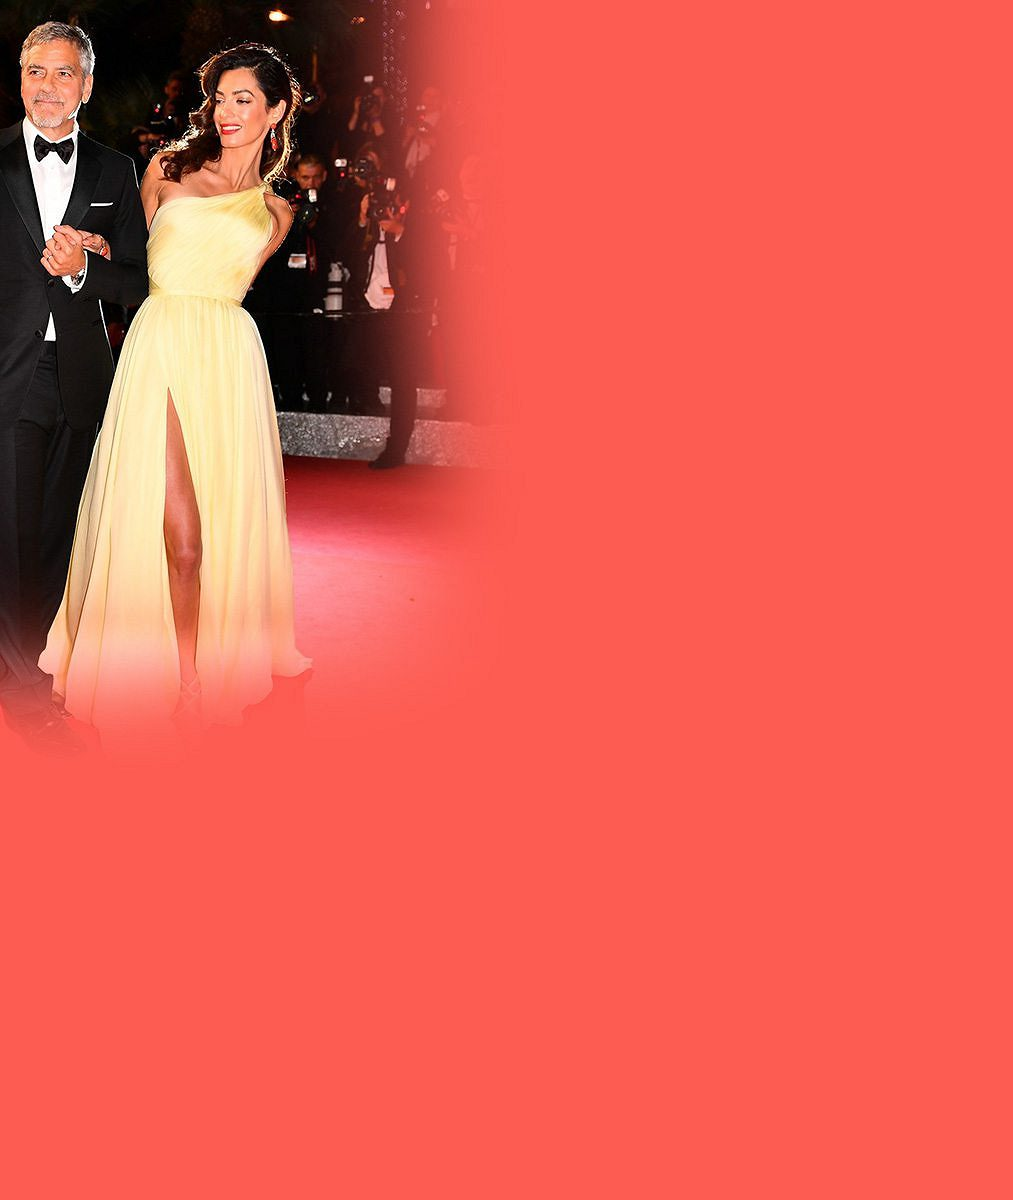 Božská Amal v Cannes neukočírovala šaty. Rozparek odhalil, co náleží manželovi Clooneymu